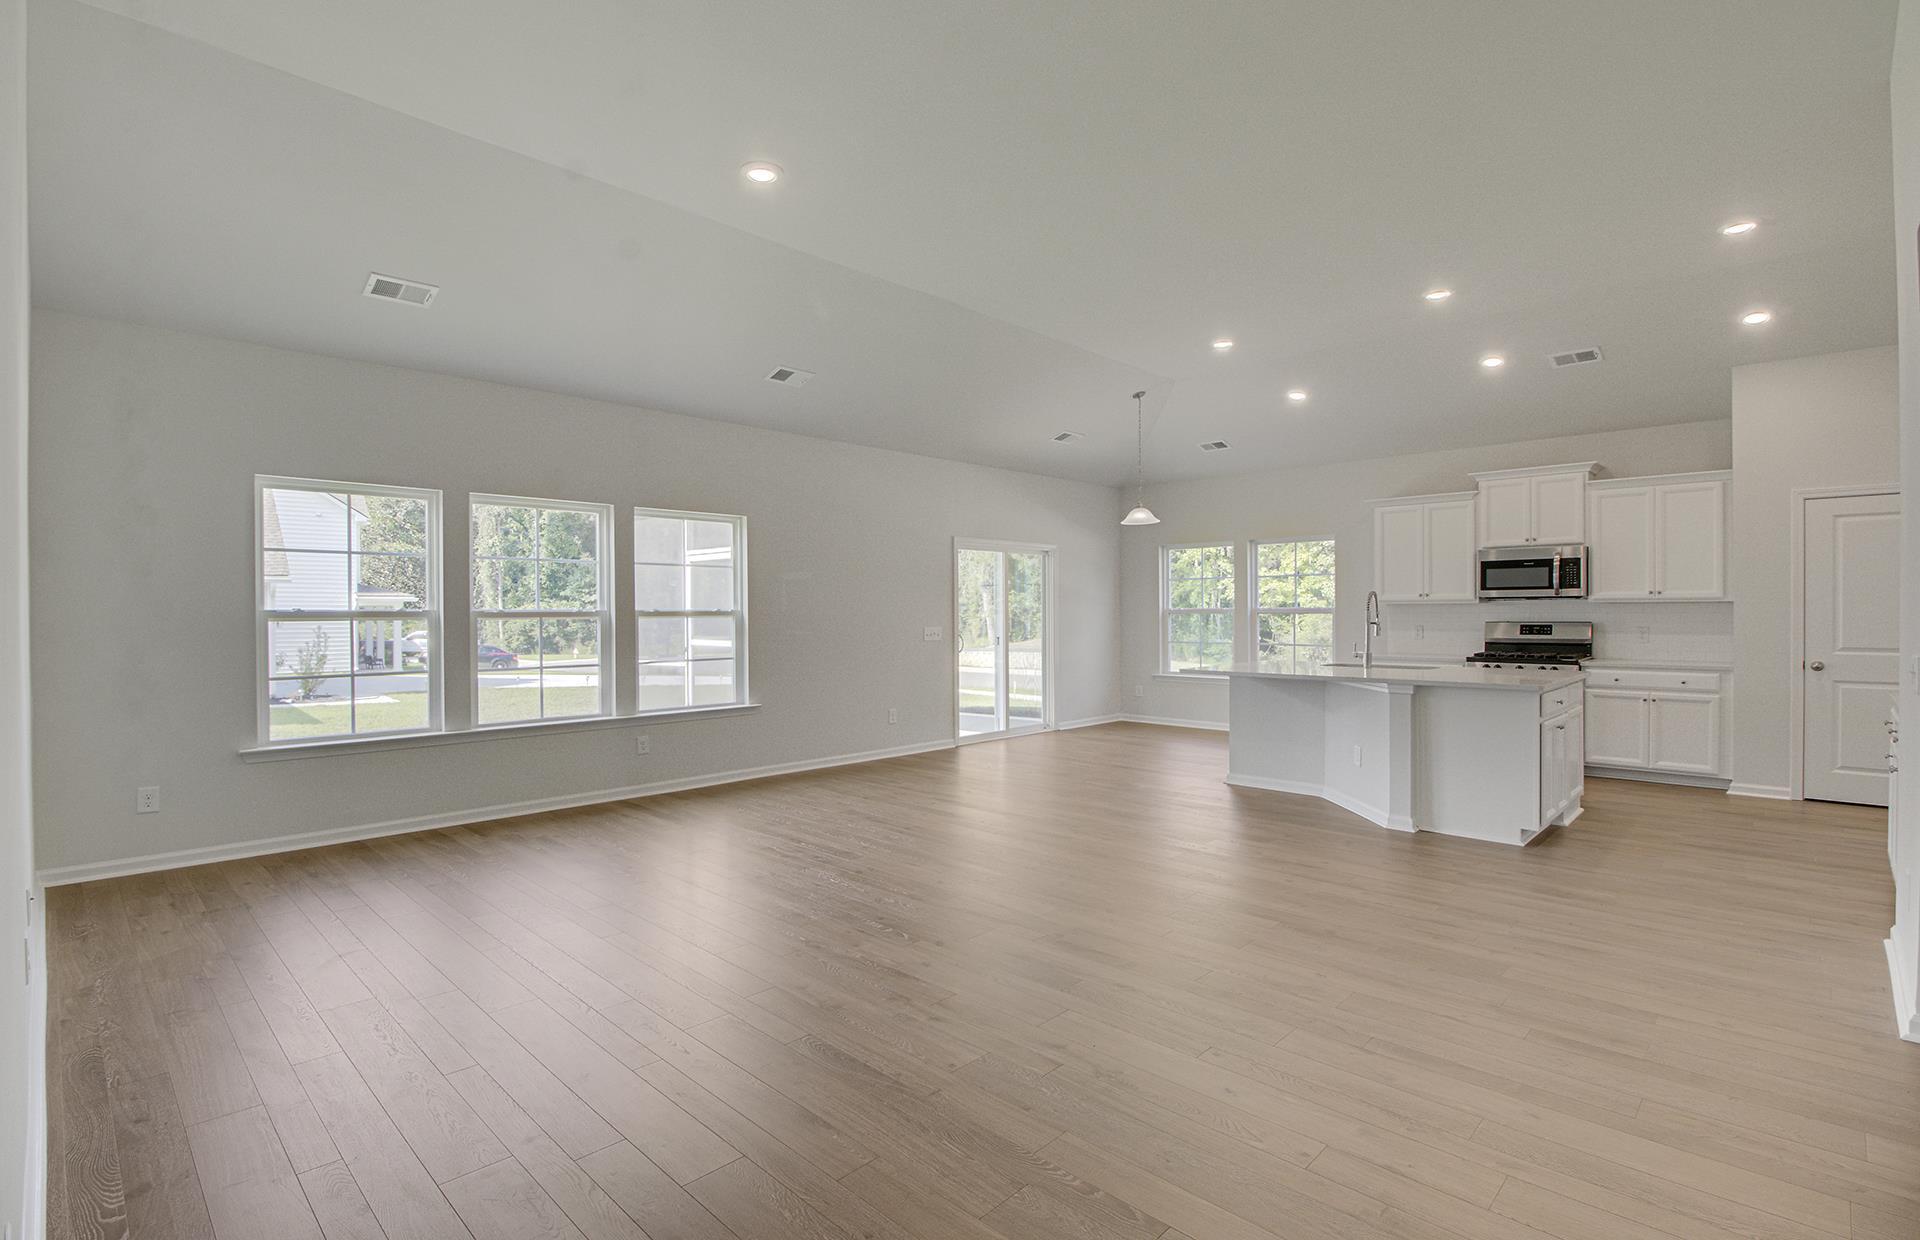 Cane Bay Plantation Homes For Sale - 205 Granton Edge, Summerville, SC - 1